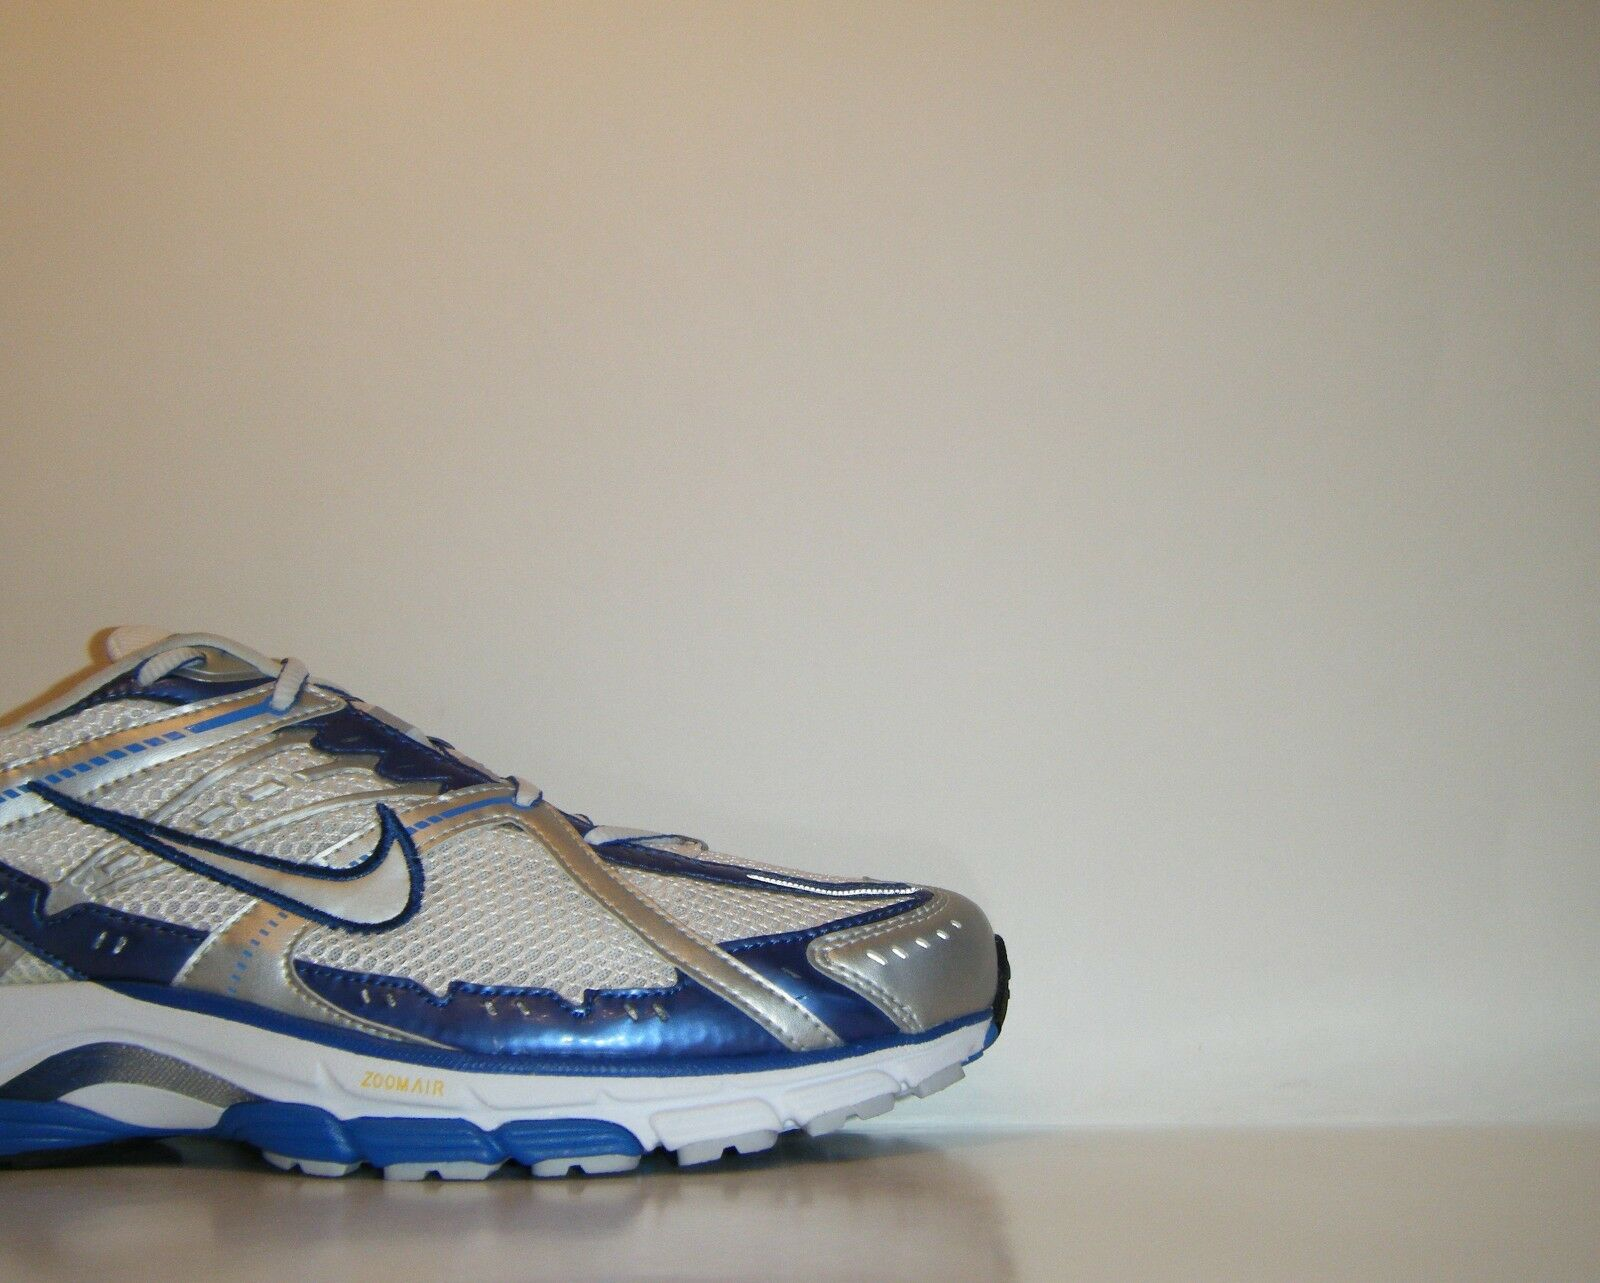 Nike Air Zoom Elite III 3 Running Bowerman Running 3 DAD SHOE  13  Pegasus Max 315163-101 52ab09